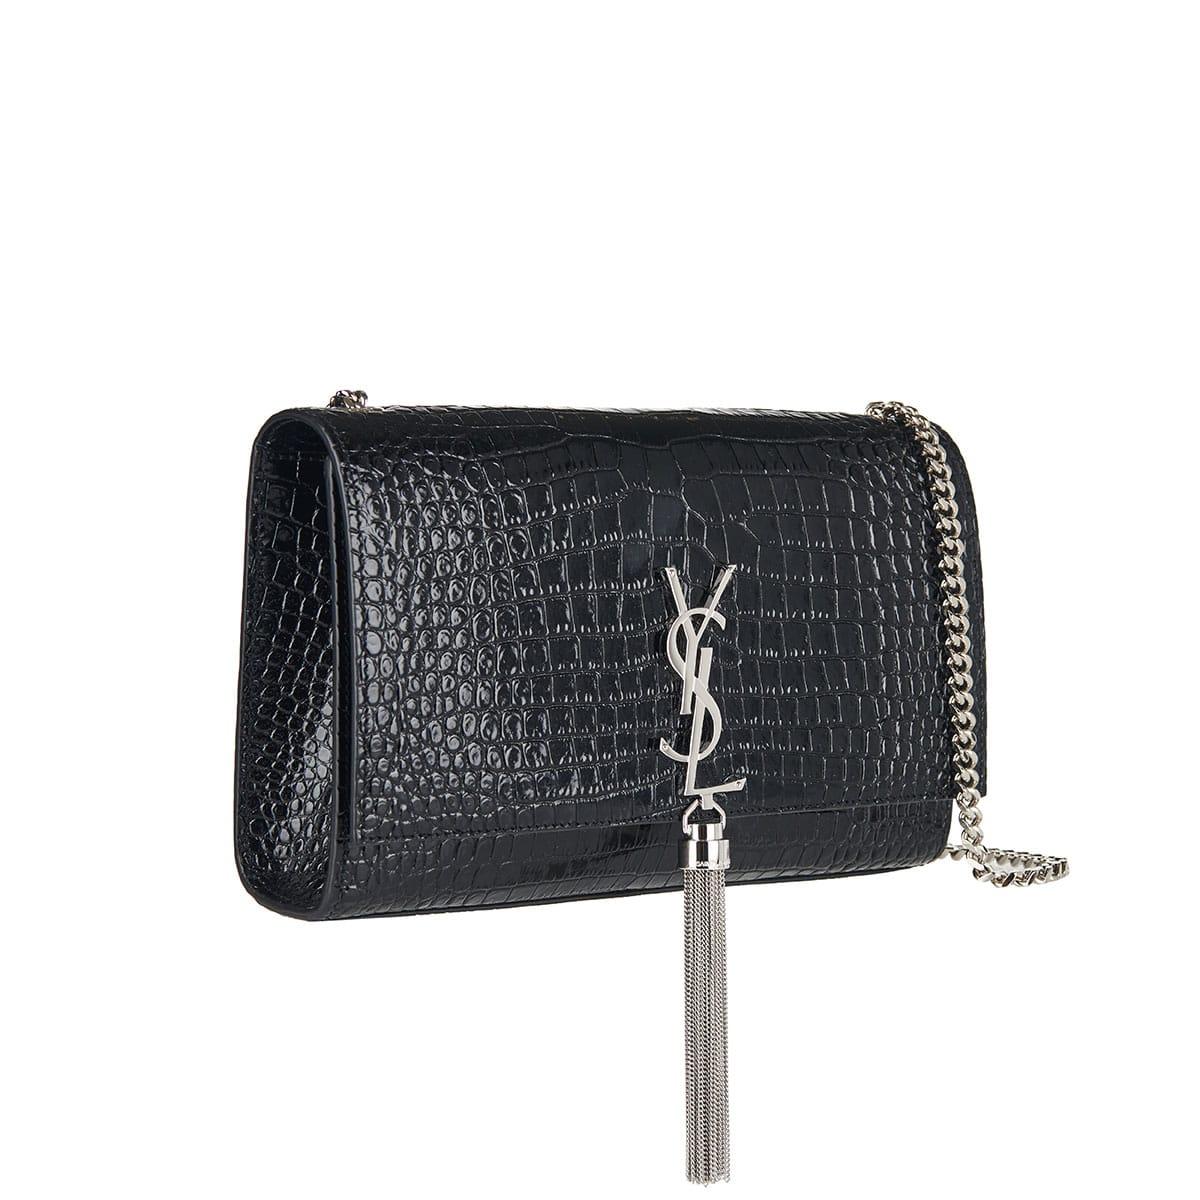 Medium Kate tassel croc-effect chain bag